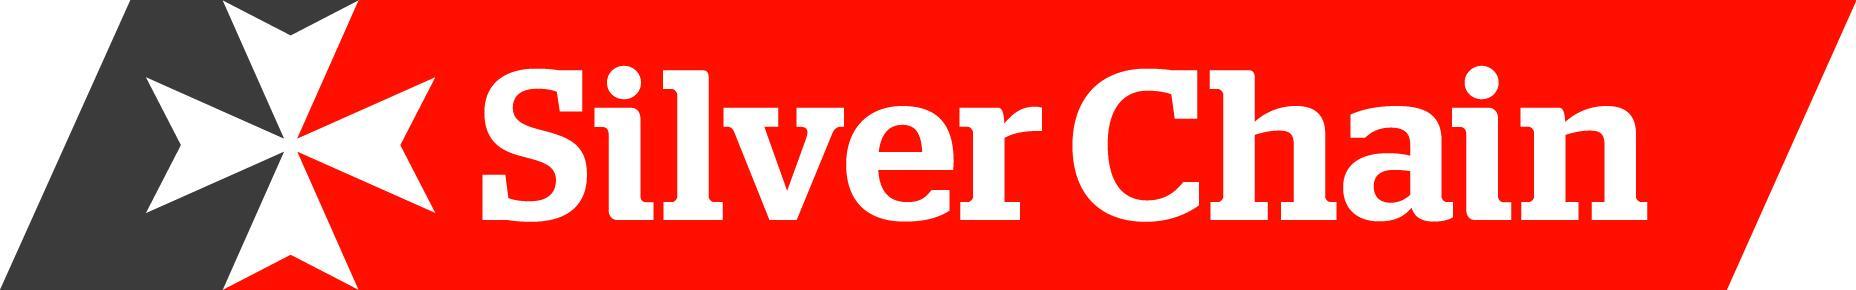 silverchain_logo_cmyk-5543007503507-0.jpg